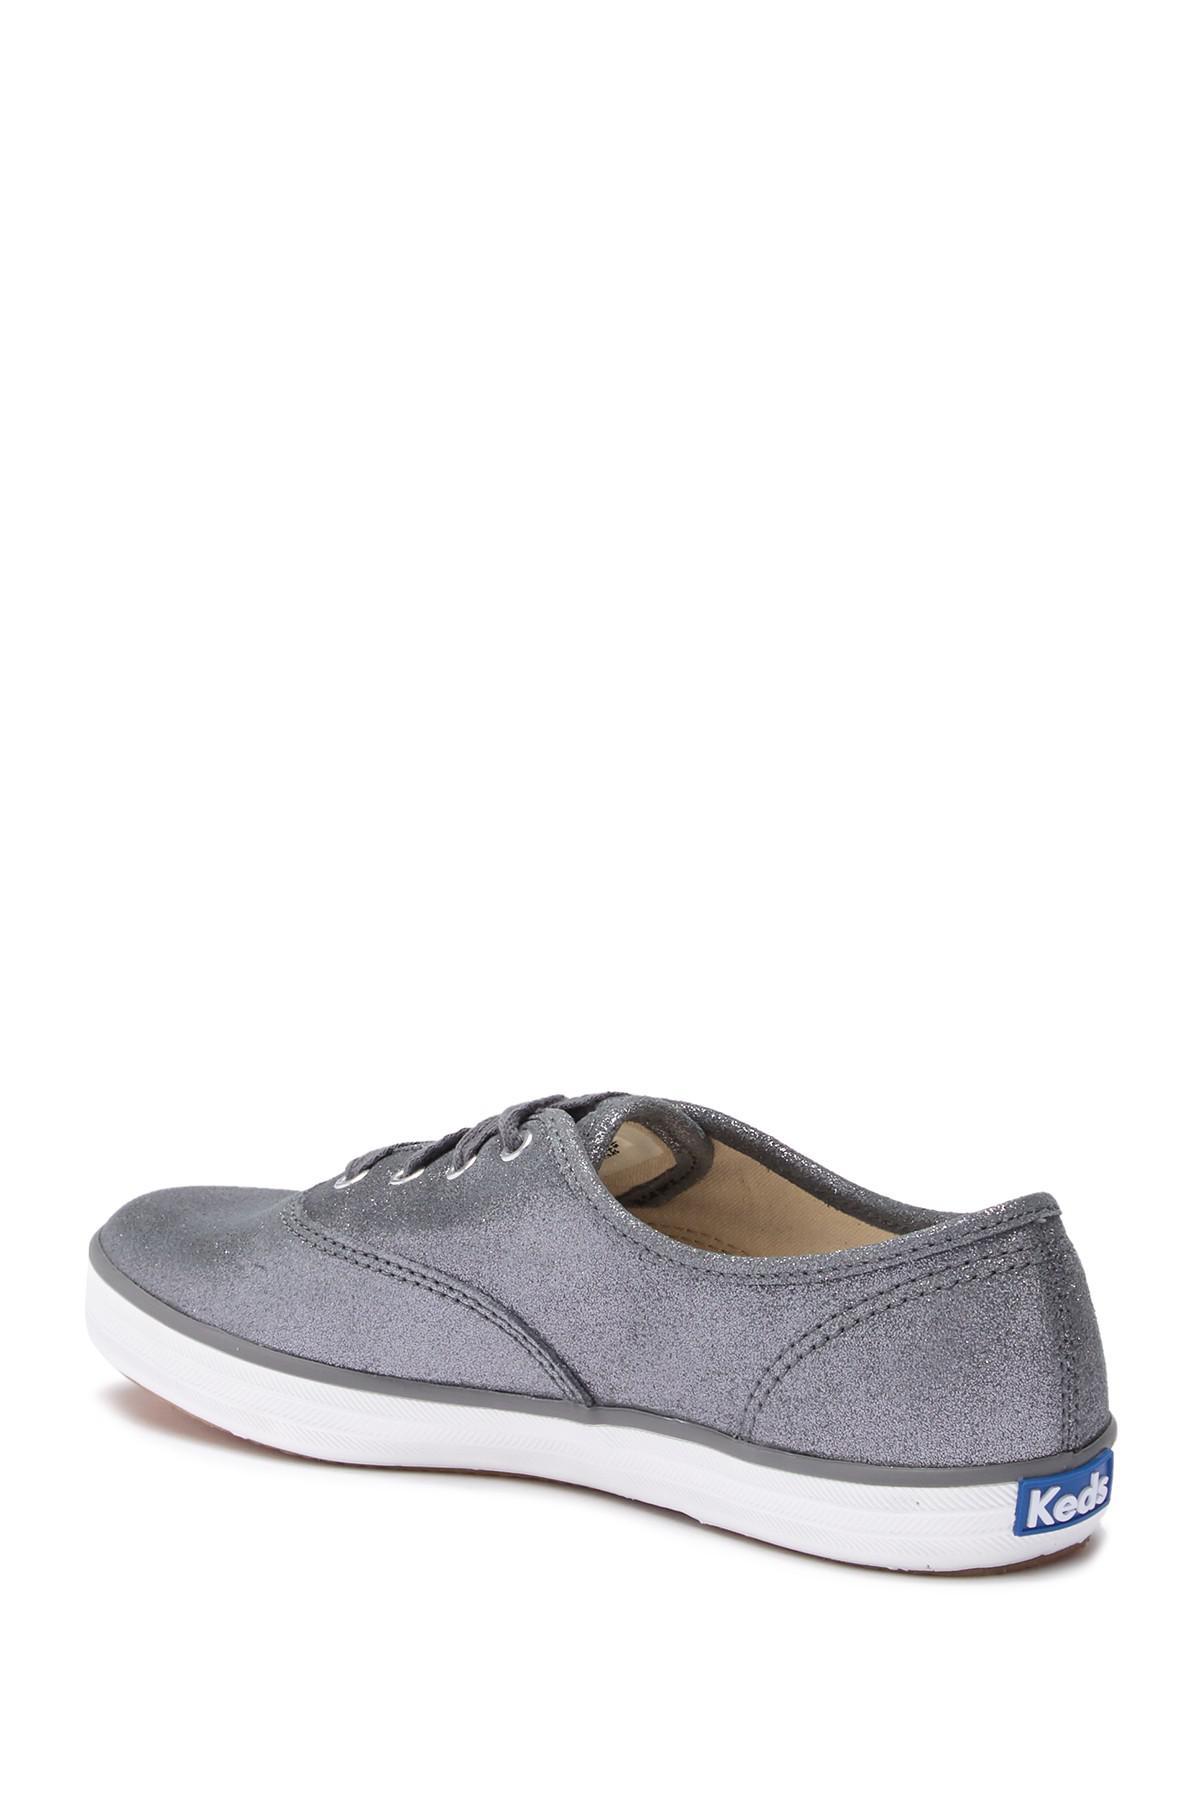 ca47d4436a15f Keds - Gray Champion Glitter Suede Sneaker - Lyst. View fullscreen